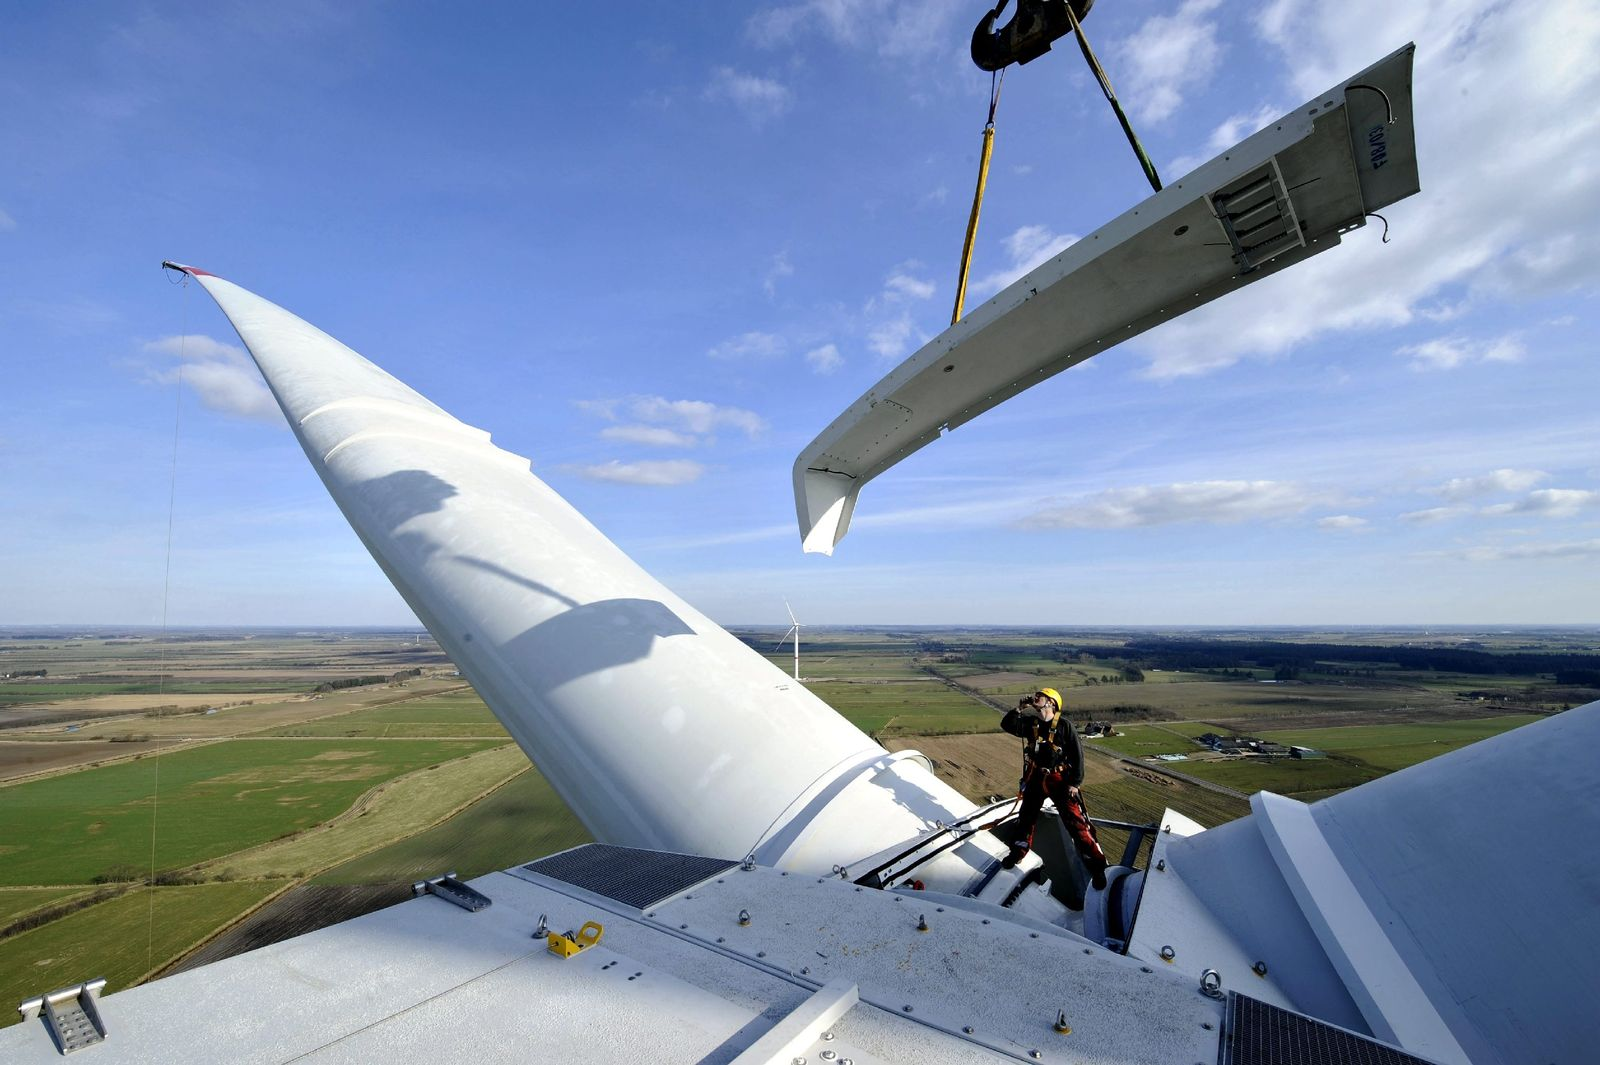 Sechs Megawatt Windkraftanlage